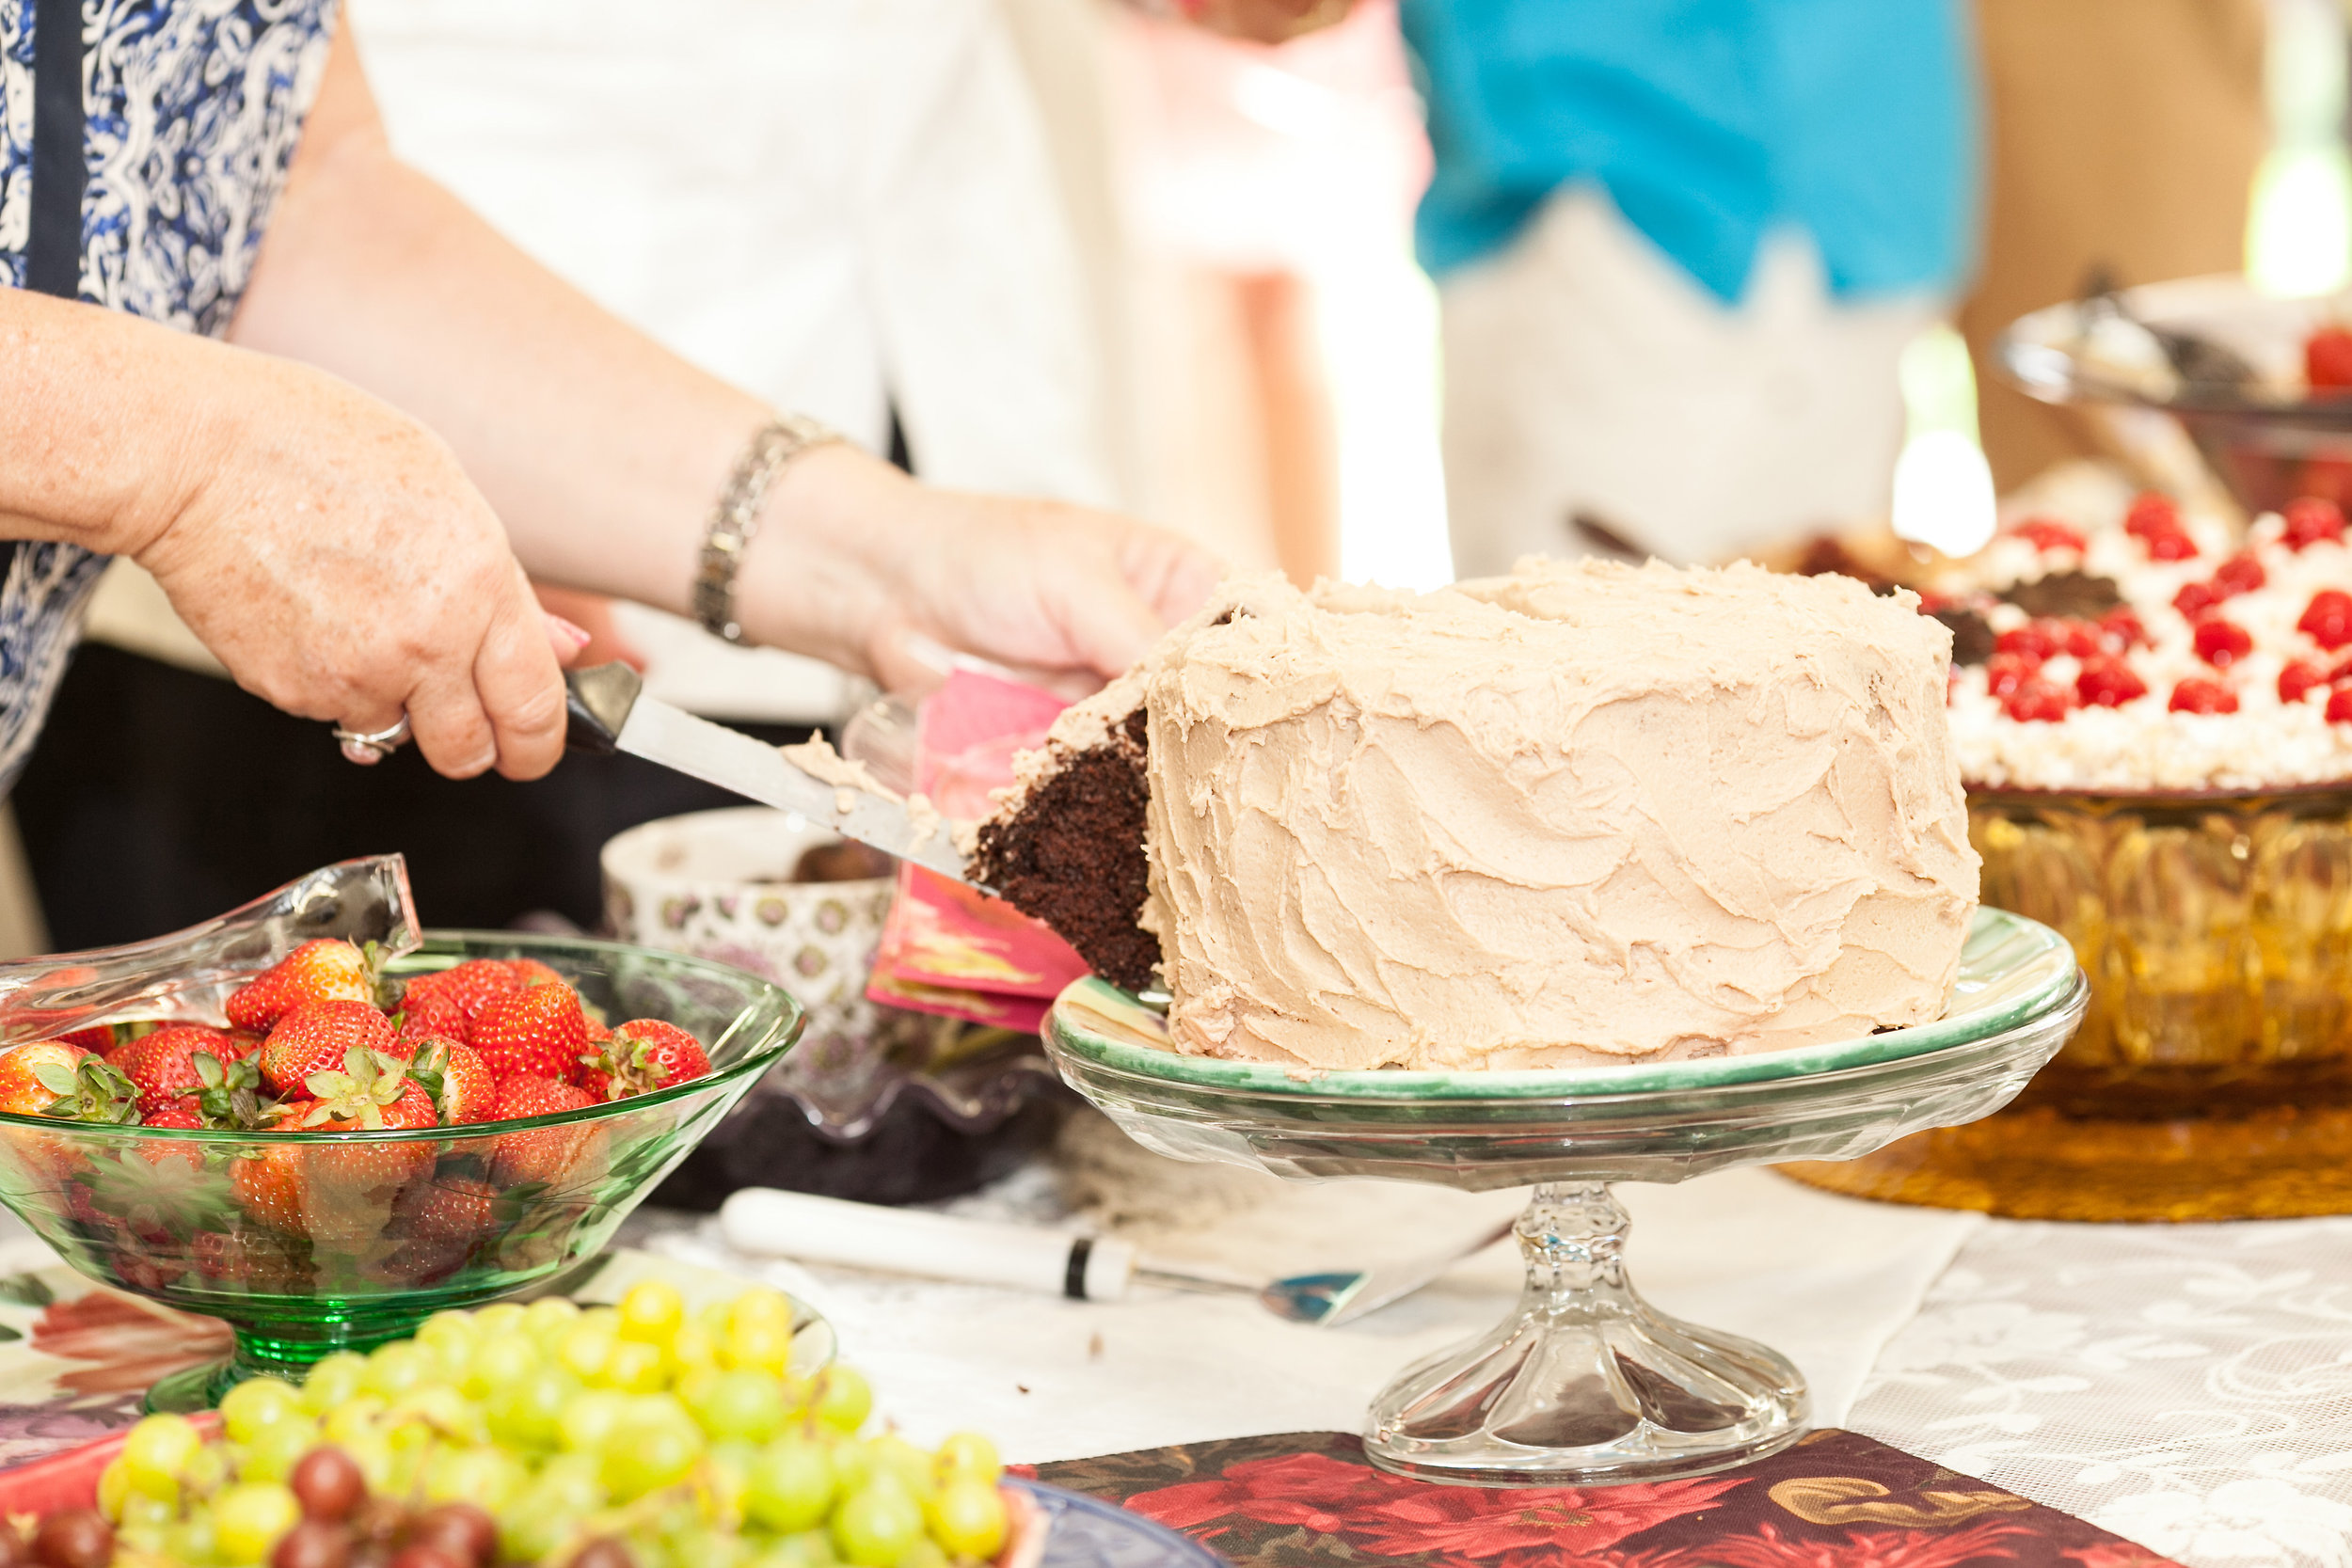 Green Glass Bowl,  Cake Pedestal #1 ,  Cake Pedestal #2 ,  Cake Pedestal #3